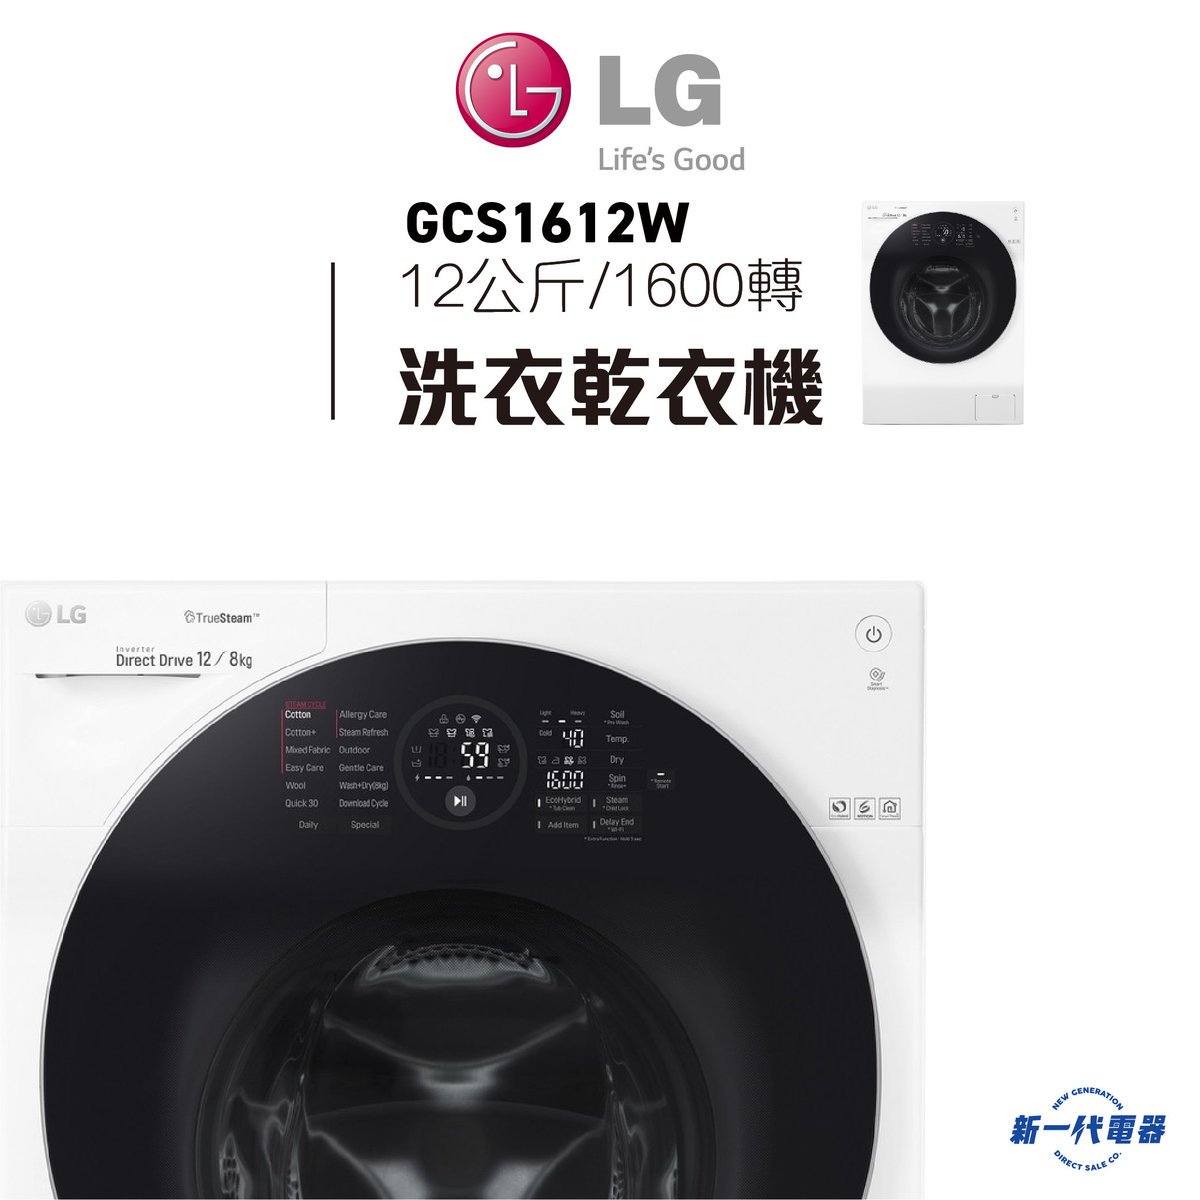 GCS1612W 12KG 1600rpm 3-in-1 Combo Washing Machine Machine (Made in Korea)